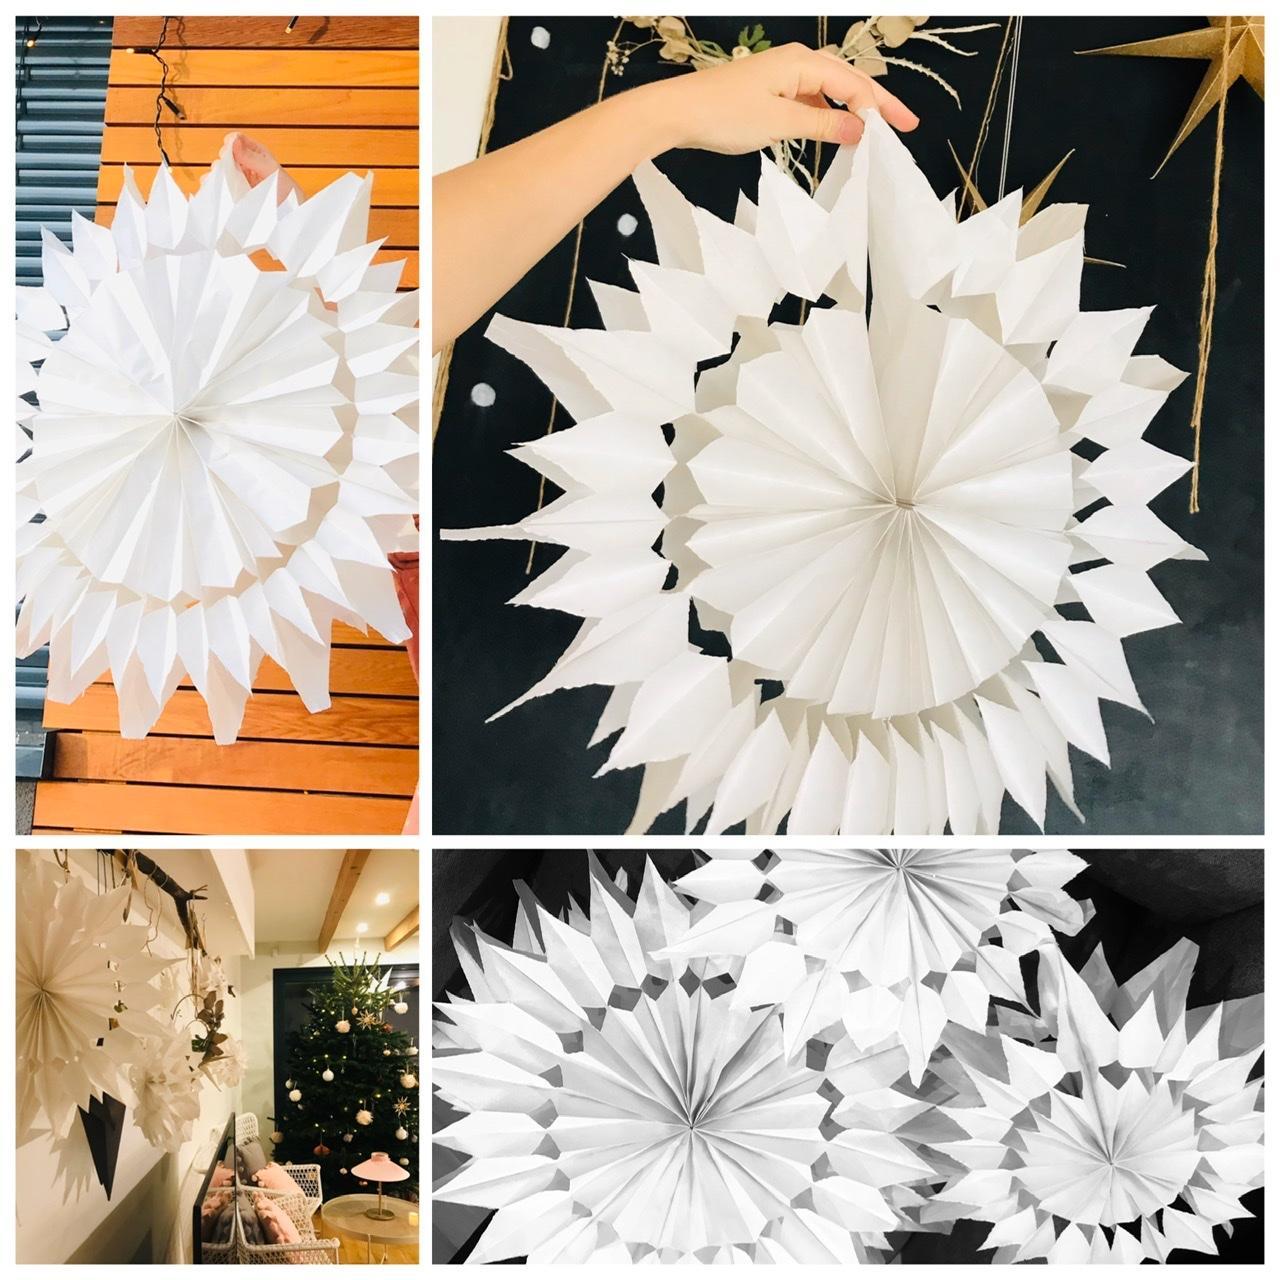 Naše L-ko - 2021 - stále dokončujeme - čriepky z vianoc - dievčatá vyrobili 10 velkých a malých  papierových hviezd